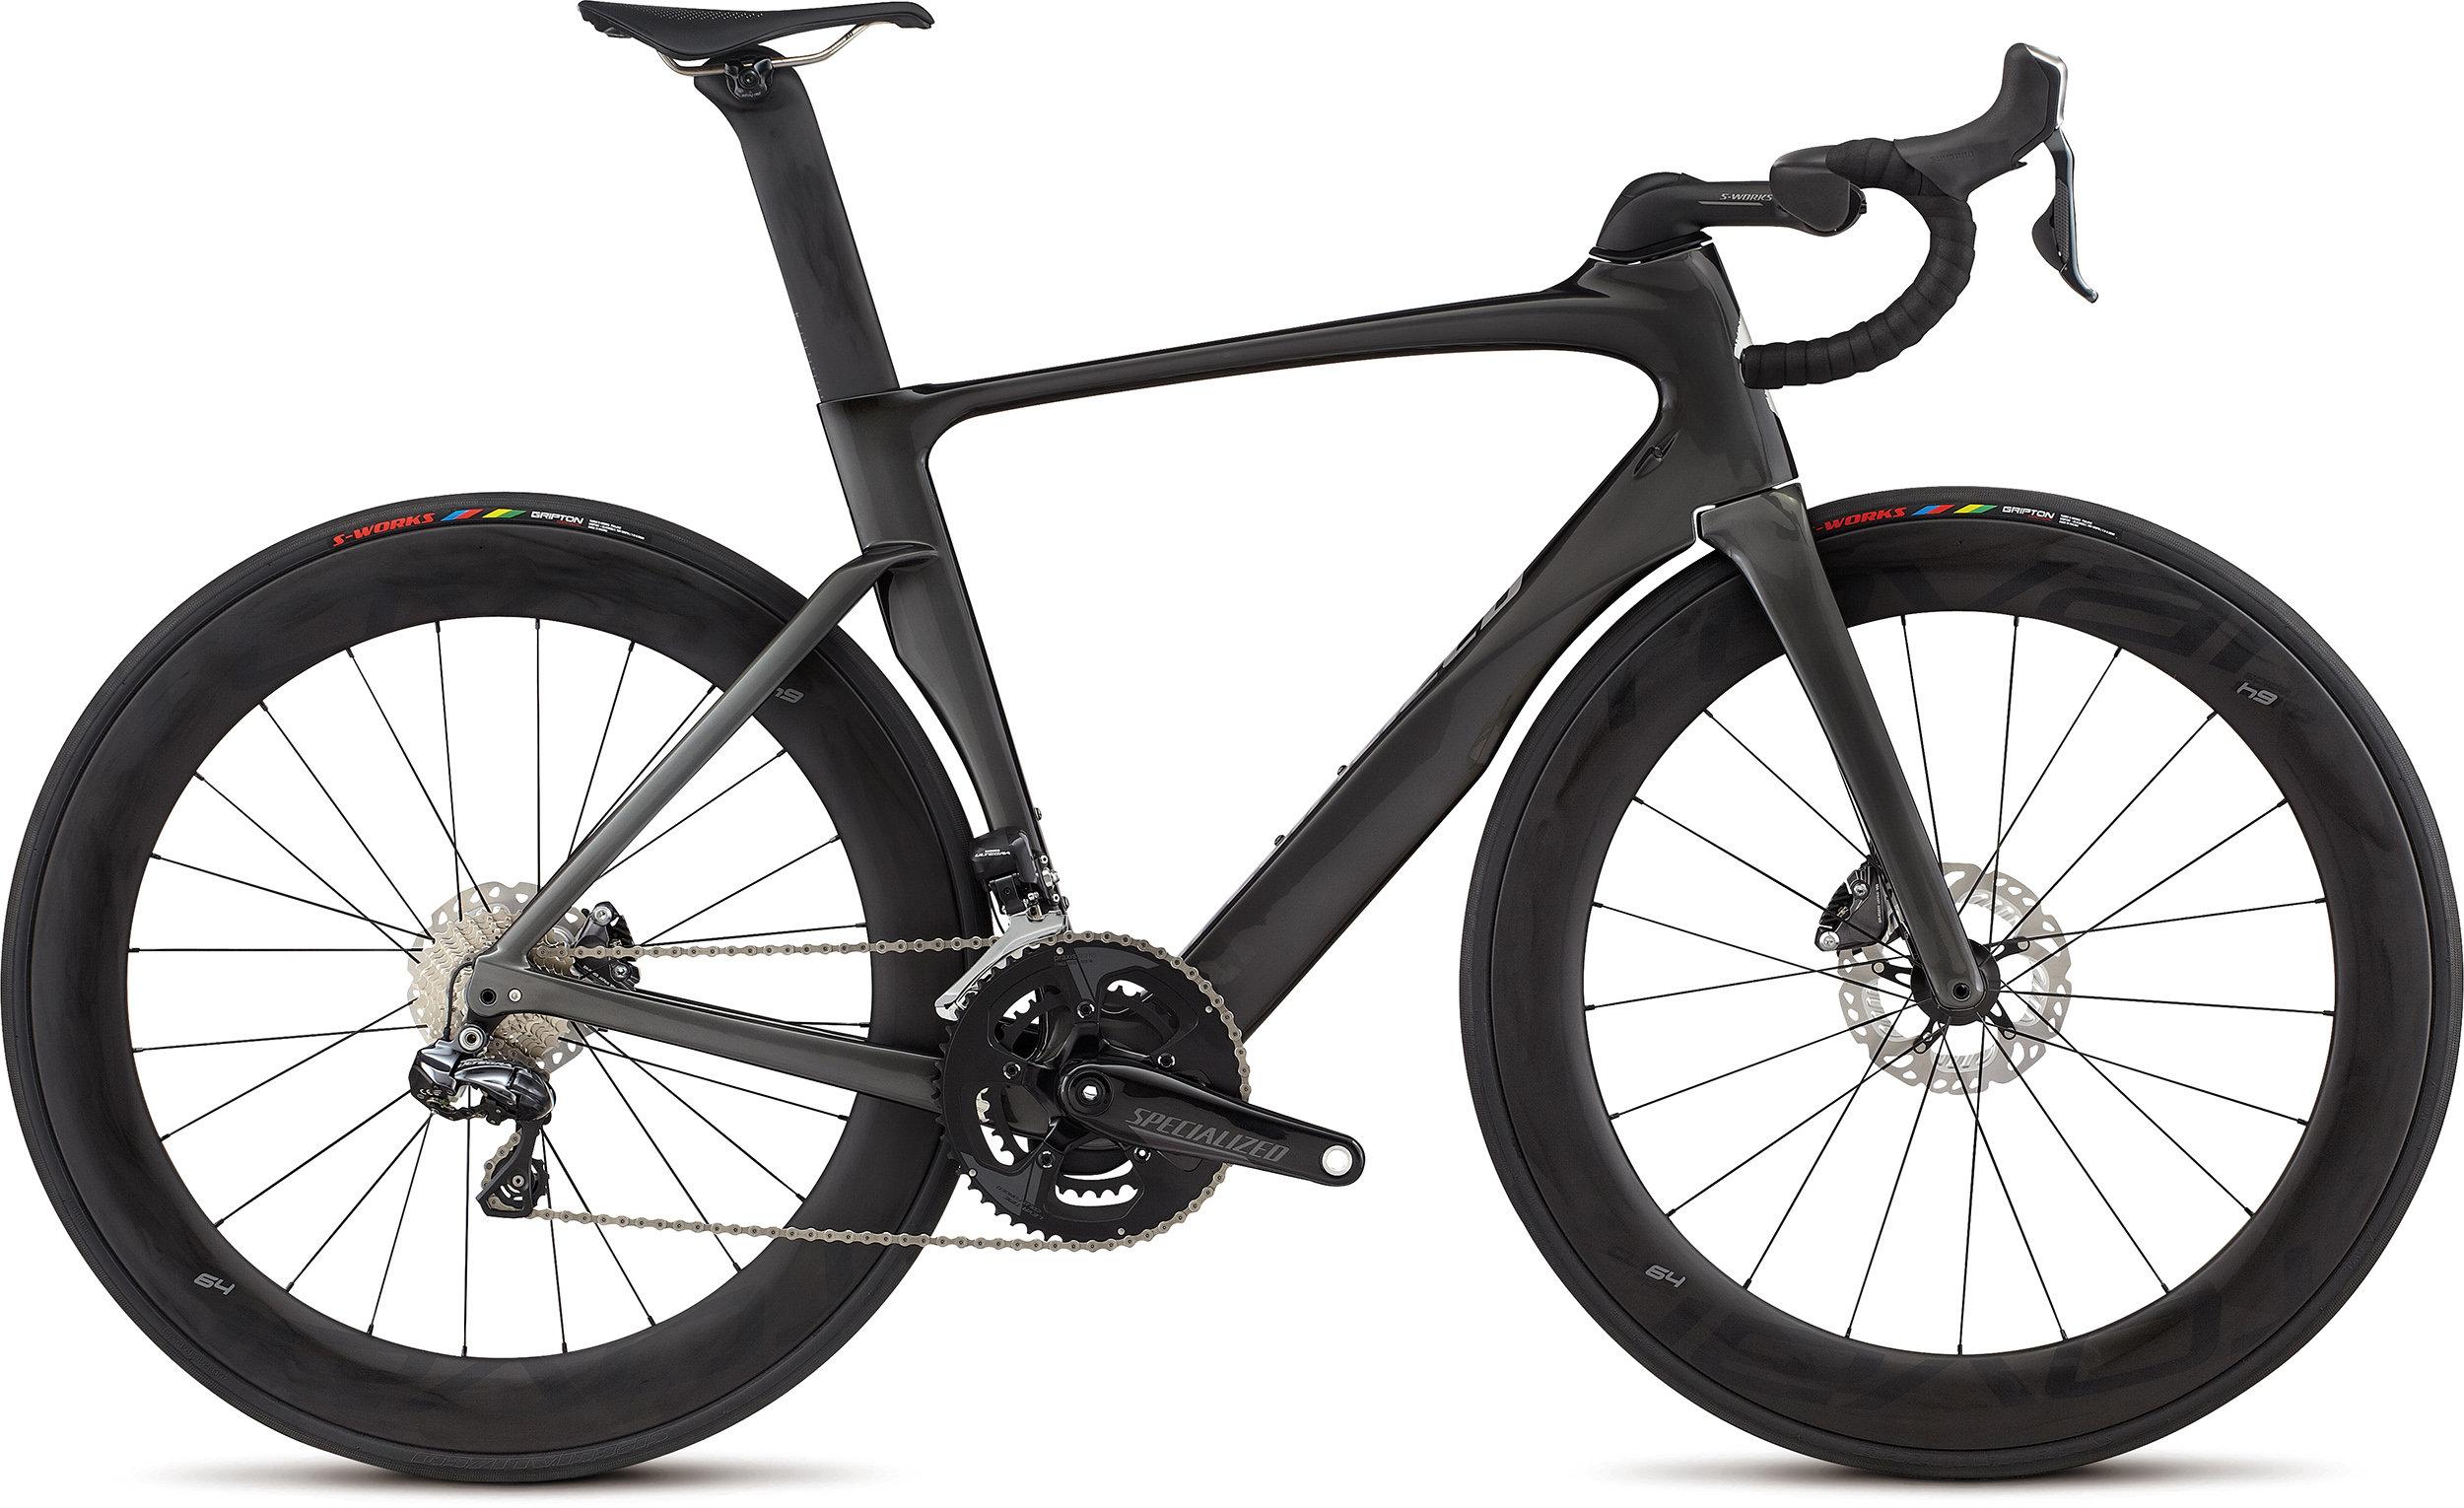 SPECIALIZED VENGE PRO DISC VIAS UDI2 TARBLK/CHAR 56 - Alpha Bikes